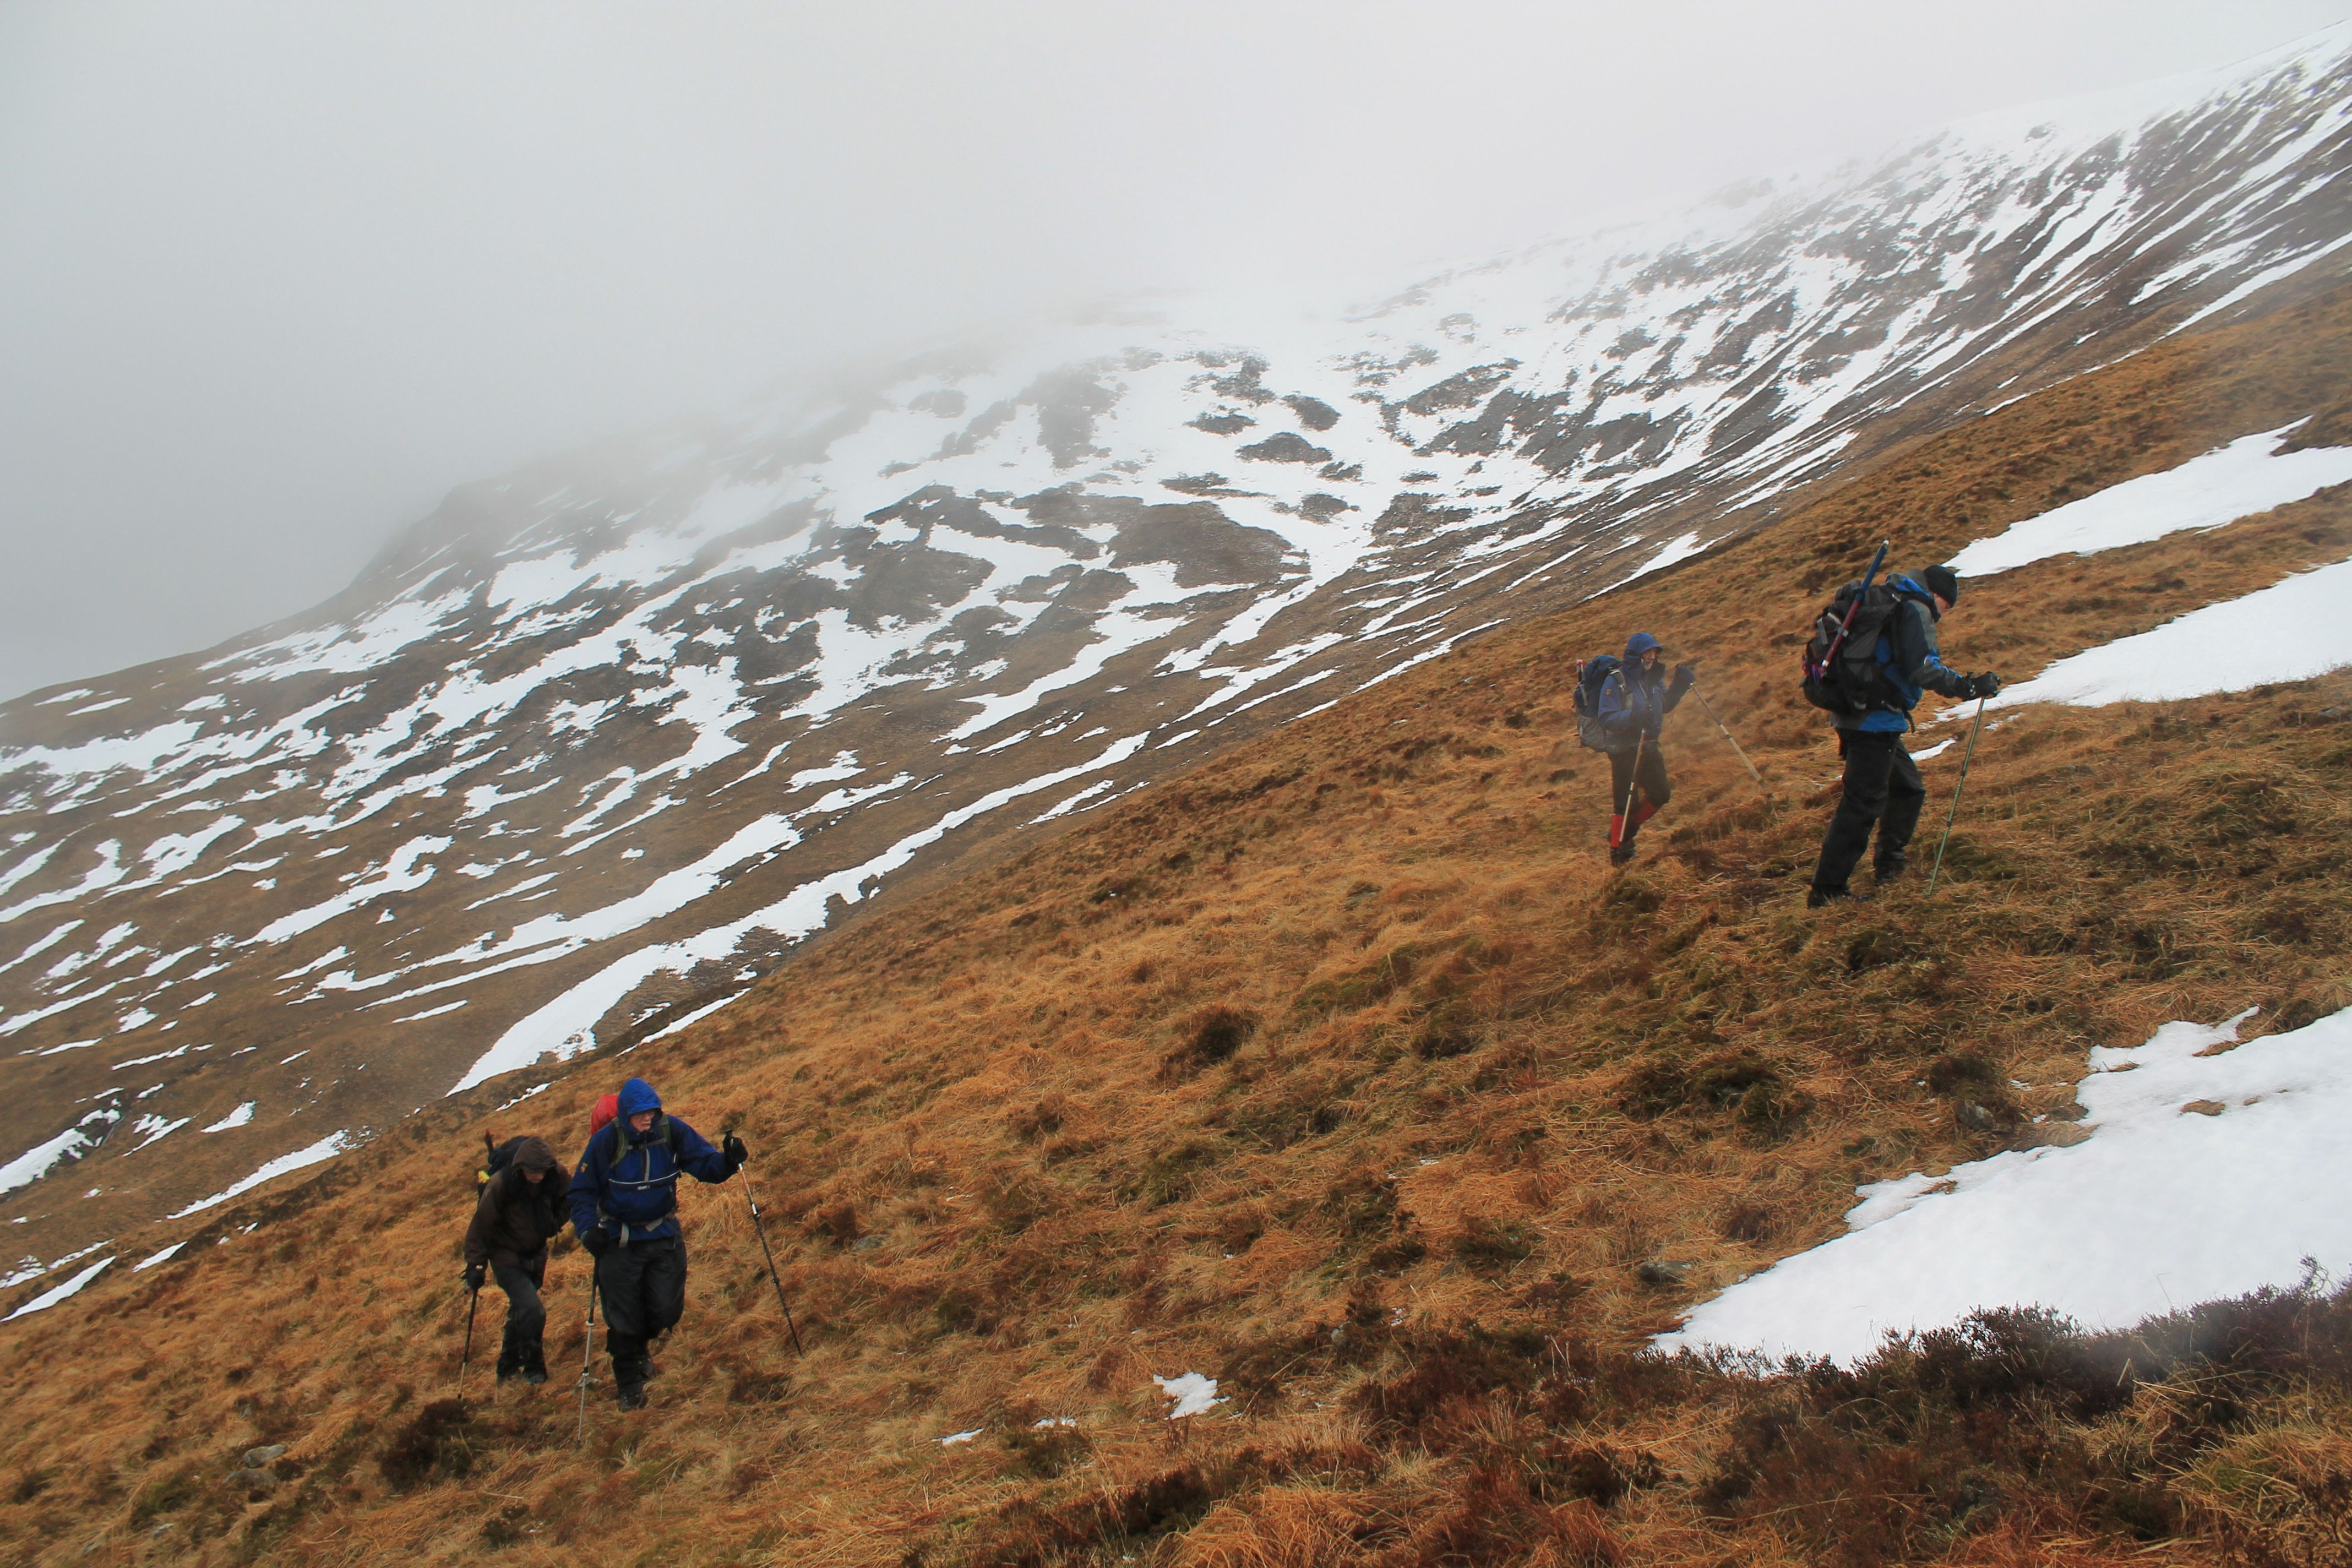 Doggedly heading up the slopes of Beinn Mhic-Mhonaidh